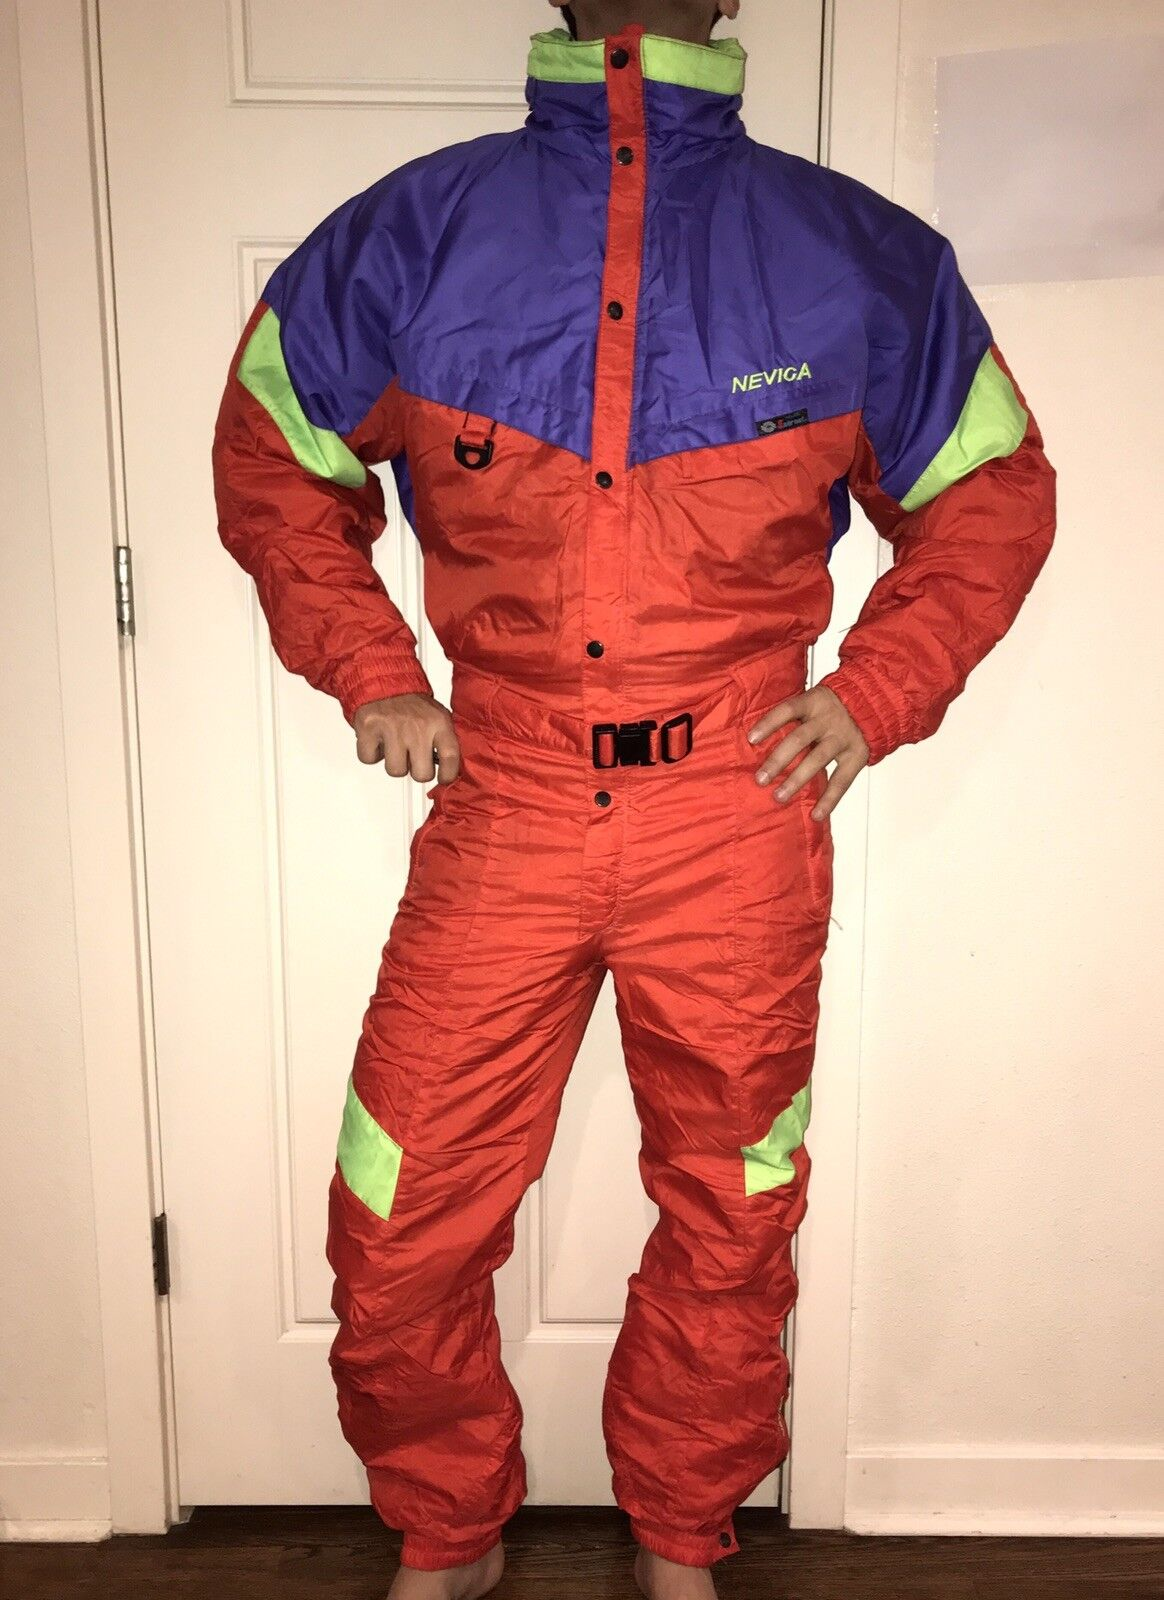 Vtg arancia 80s 90s arancia Vtg NEVICA Uomo Medium One Piece SKI SUIT Snow Bib Snowsuit 40 M f9c6cb